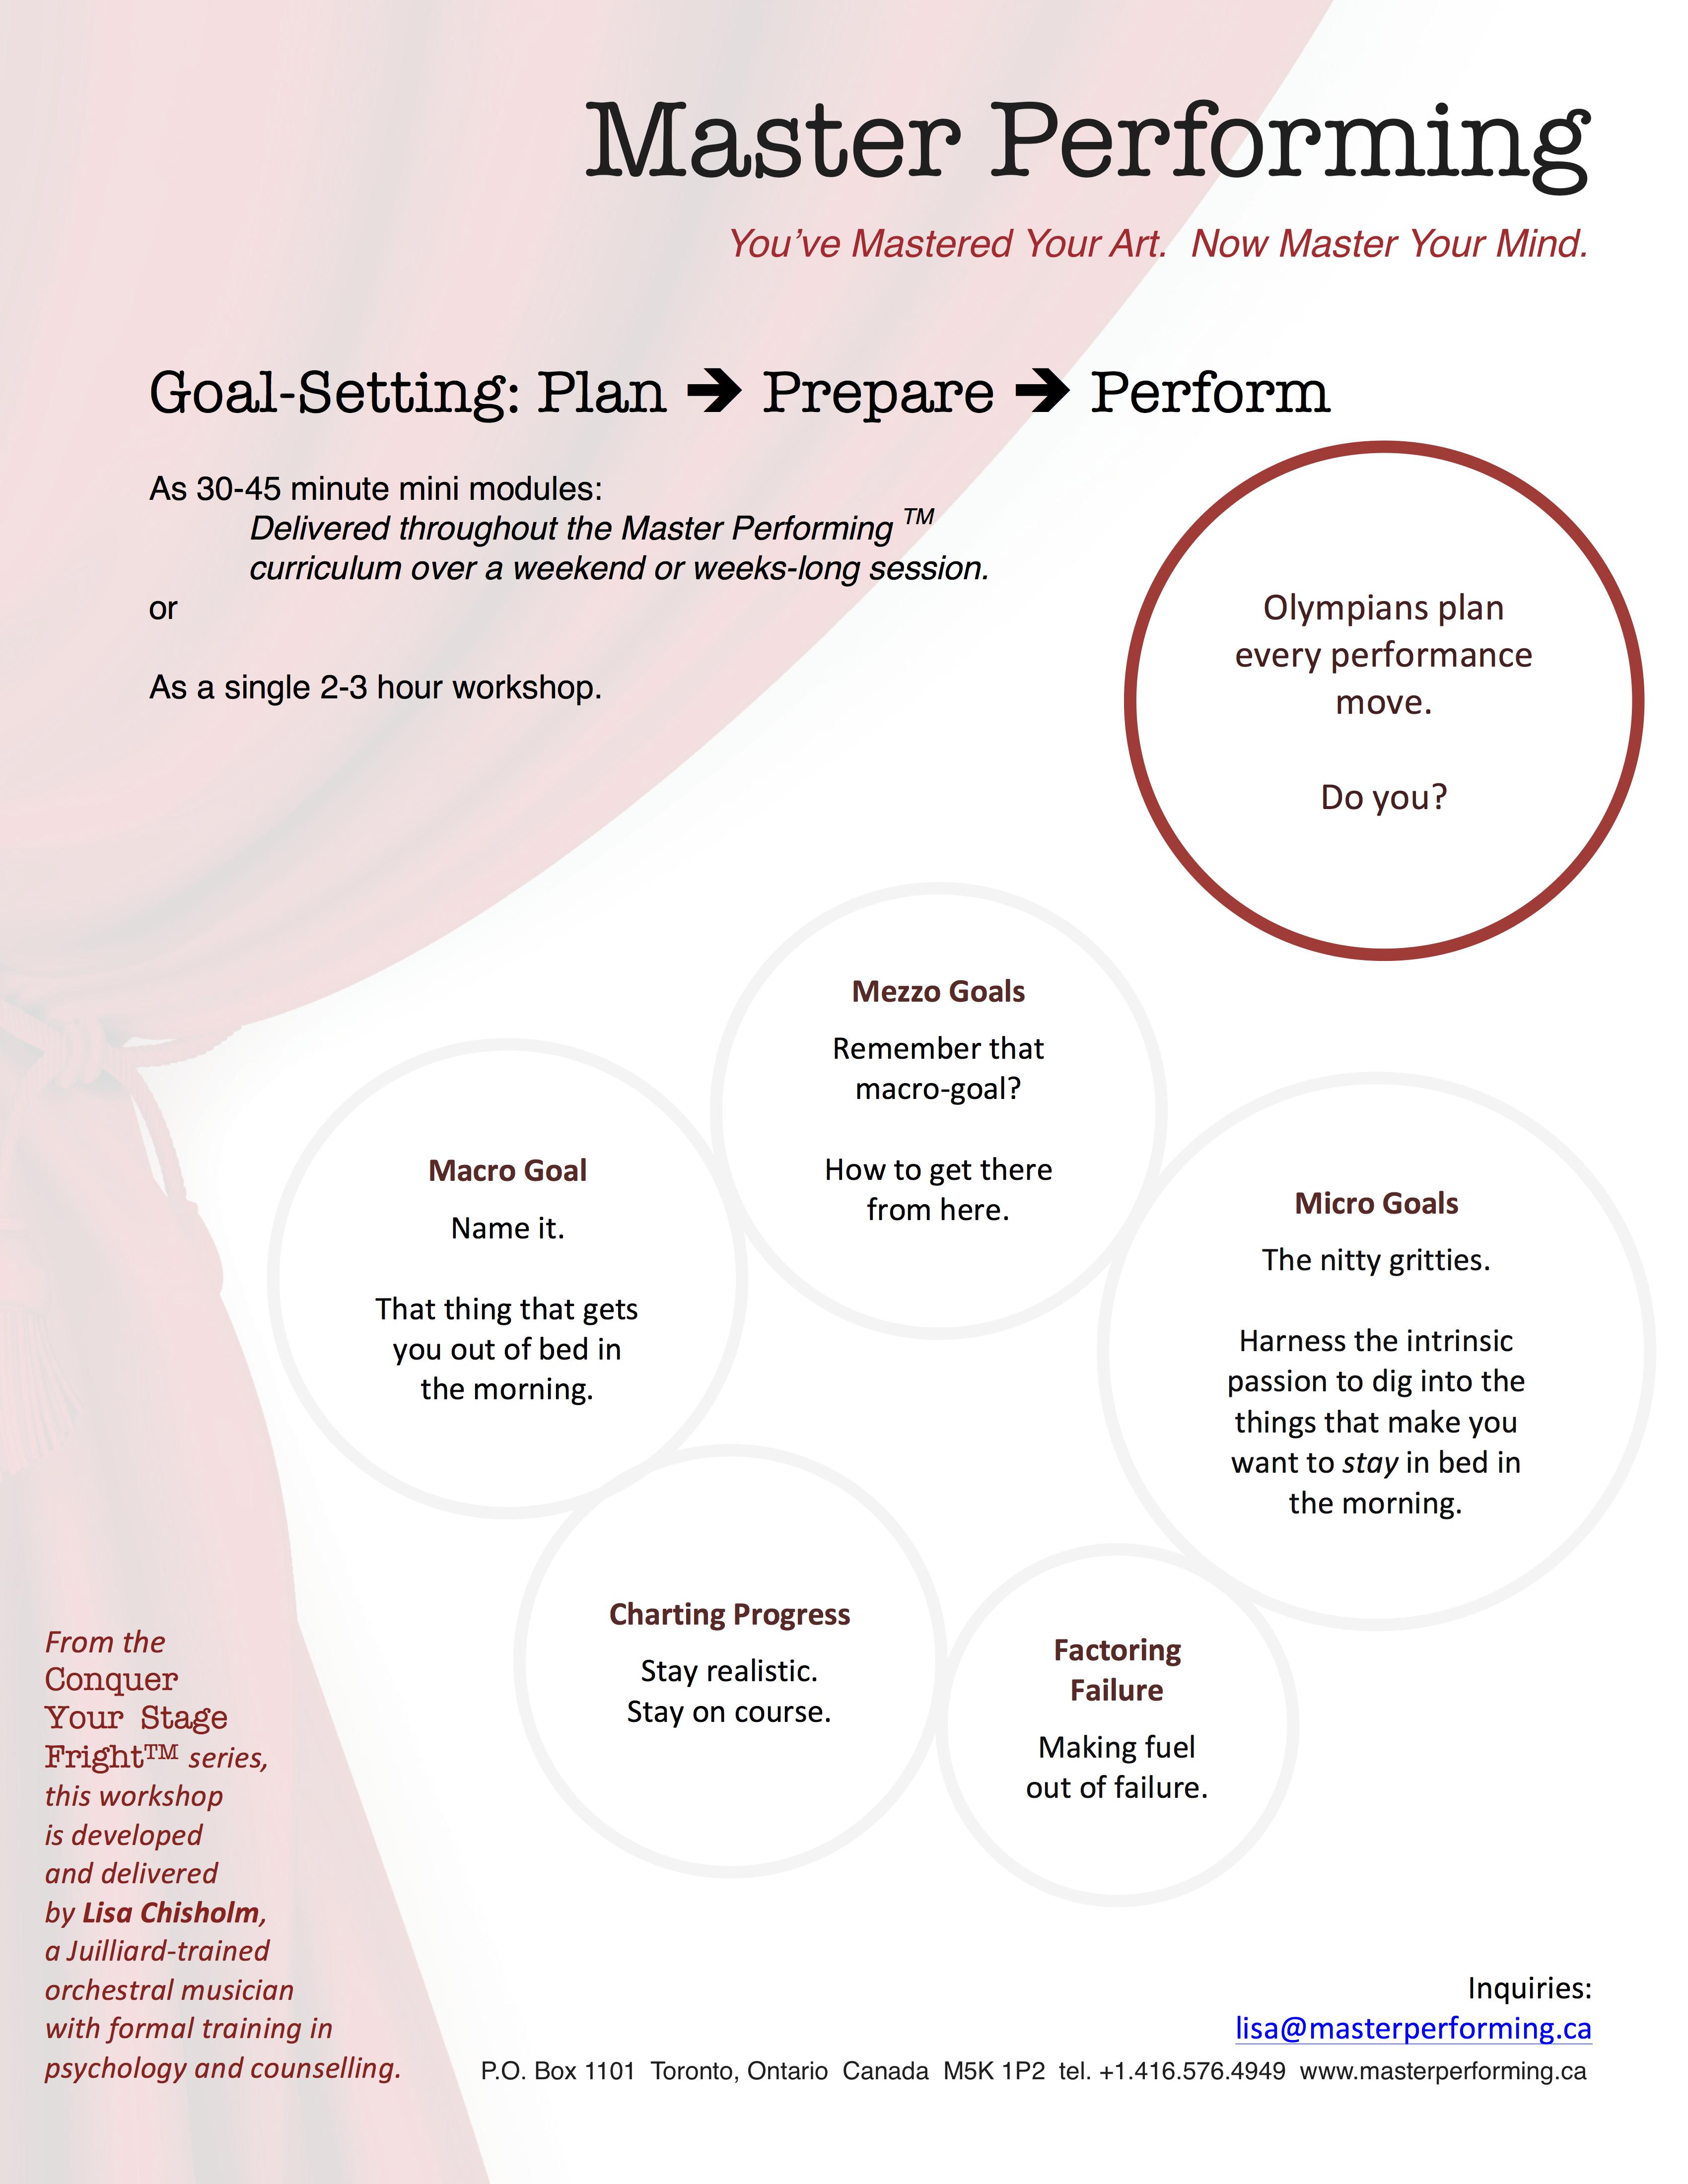 master-performing-workshop-goal-setting-plan-prepare-perform